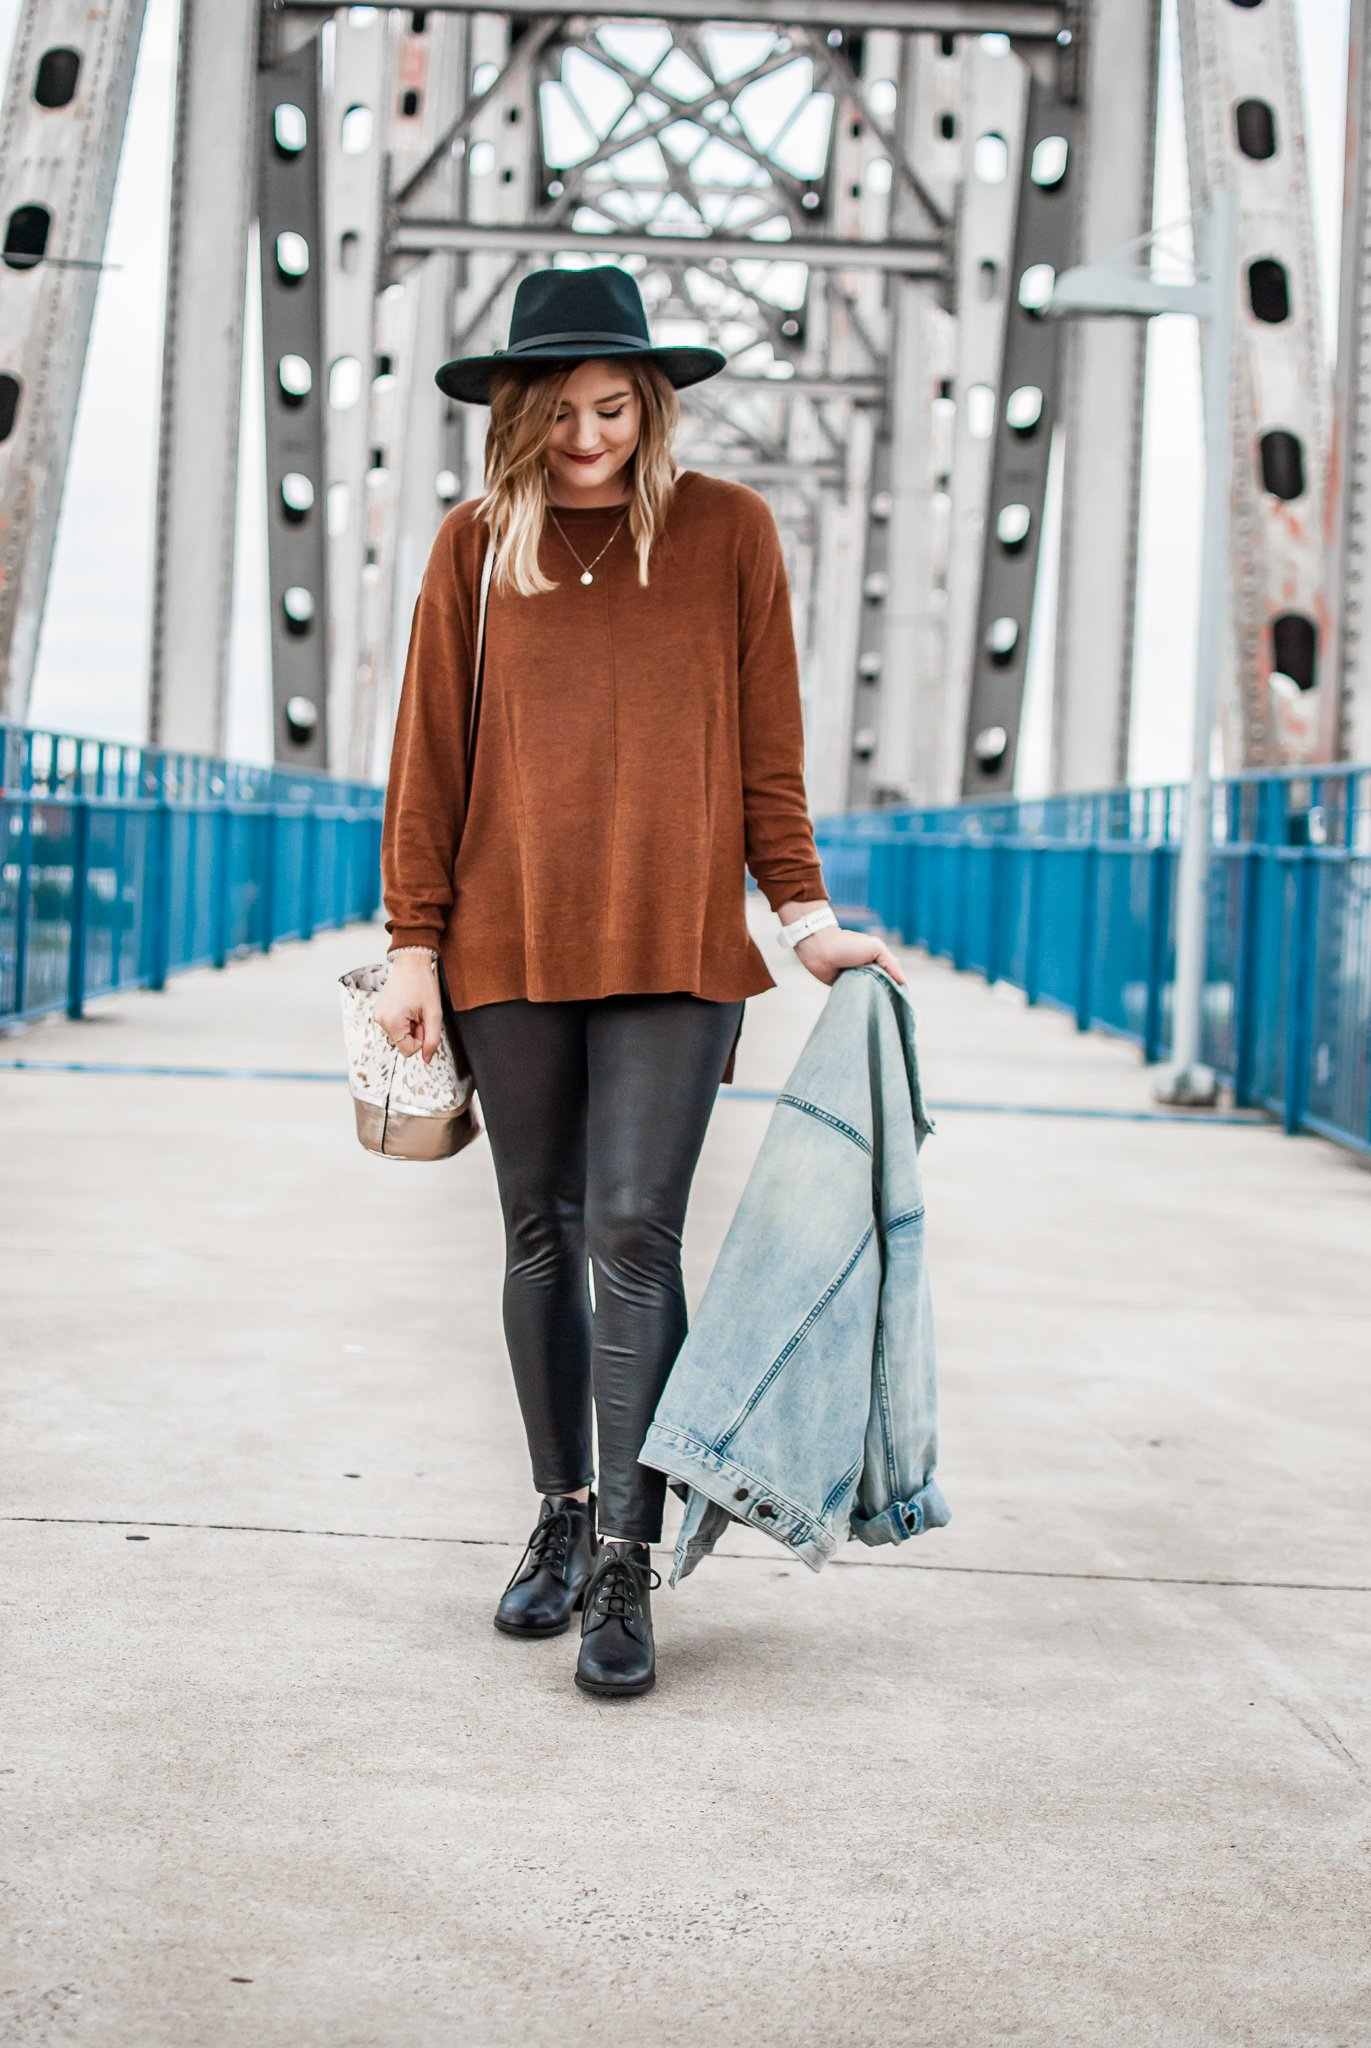 H&M Sweater Roundup